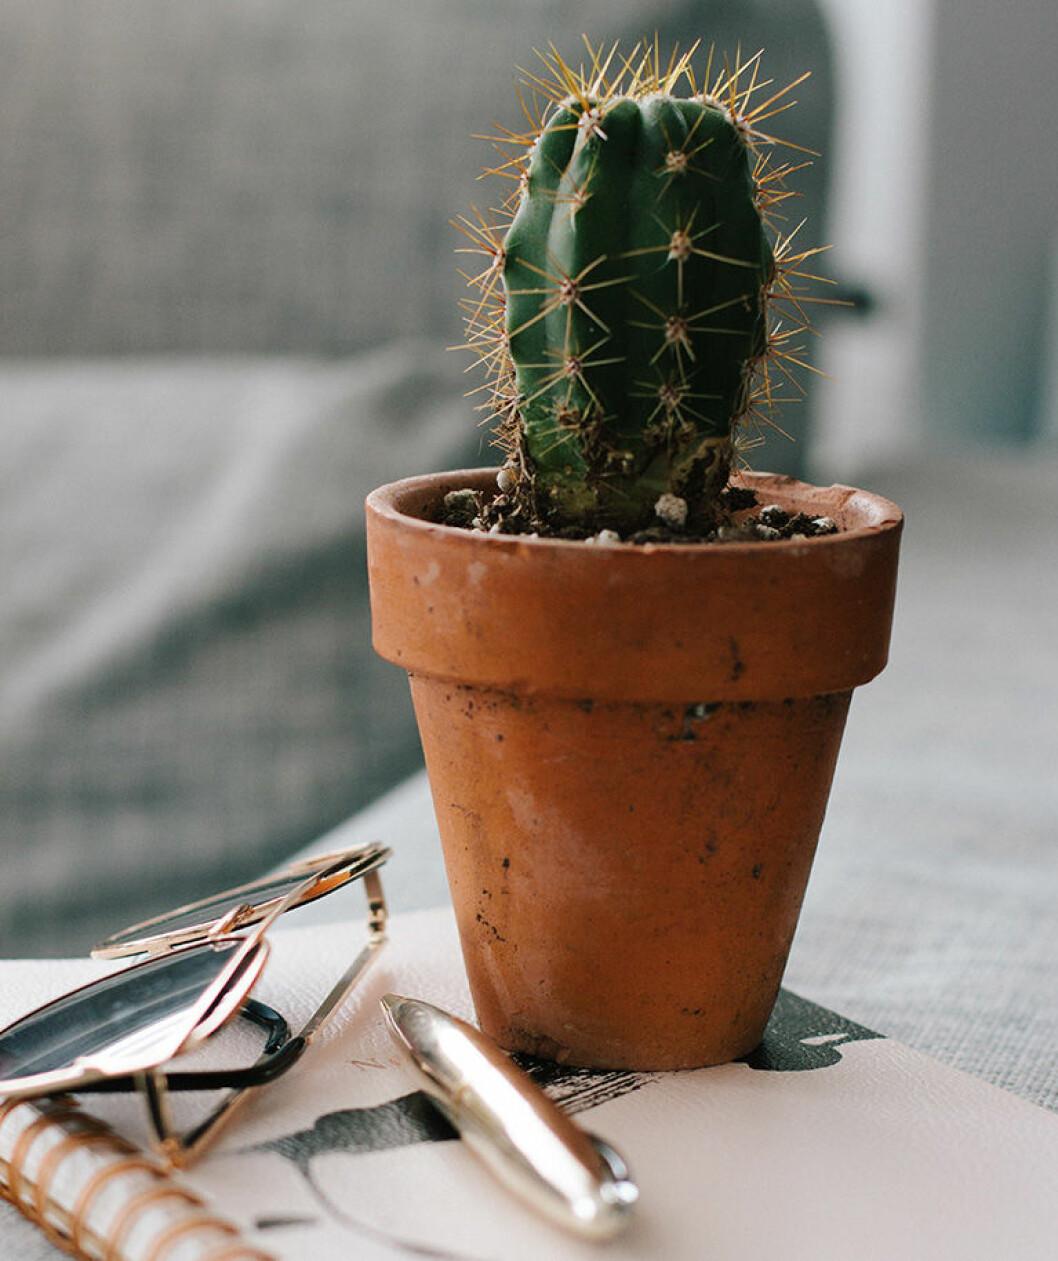 Liten kaktus i kruka